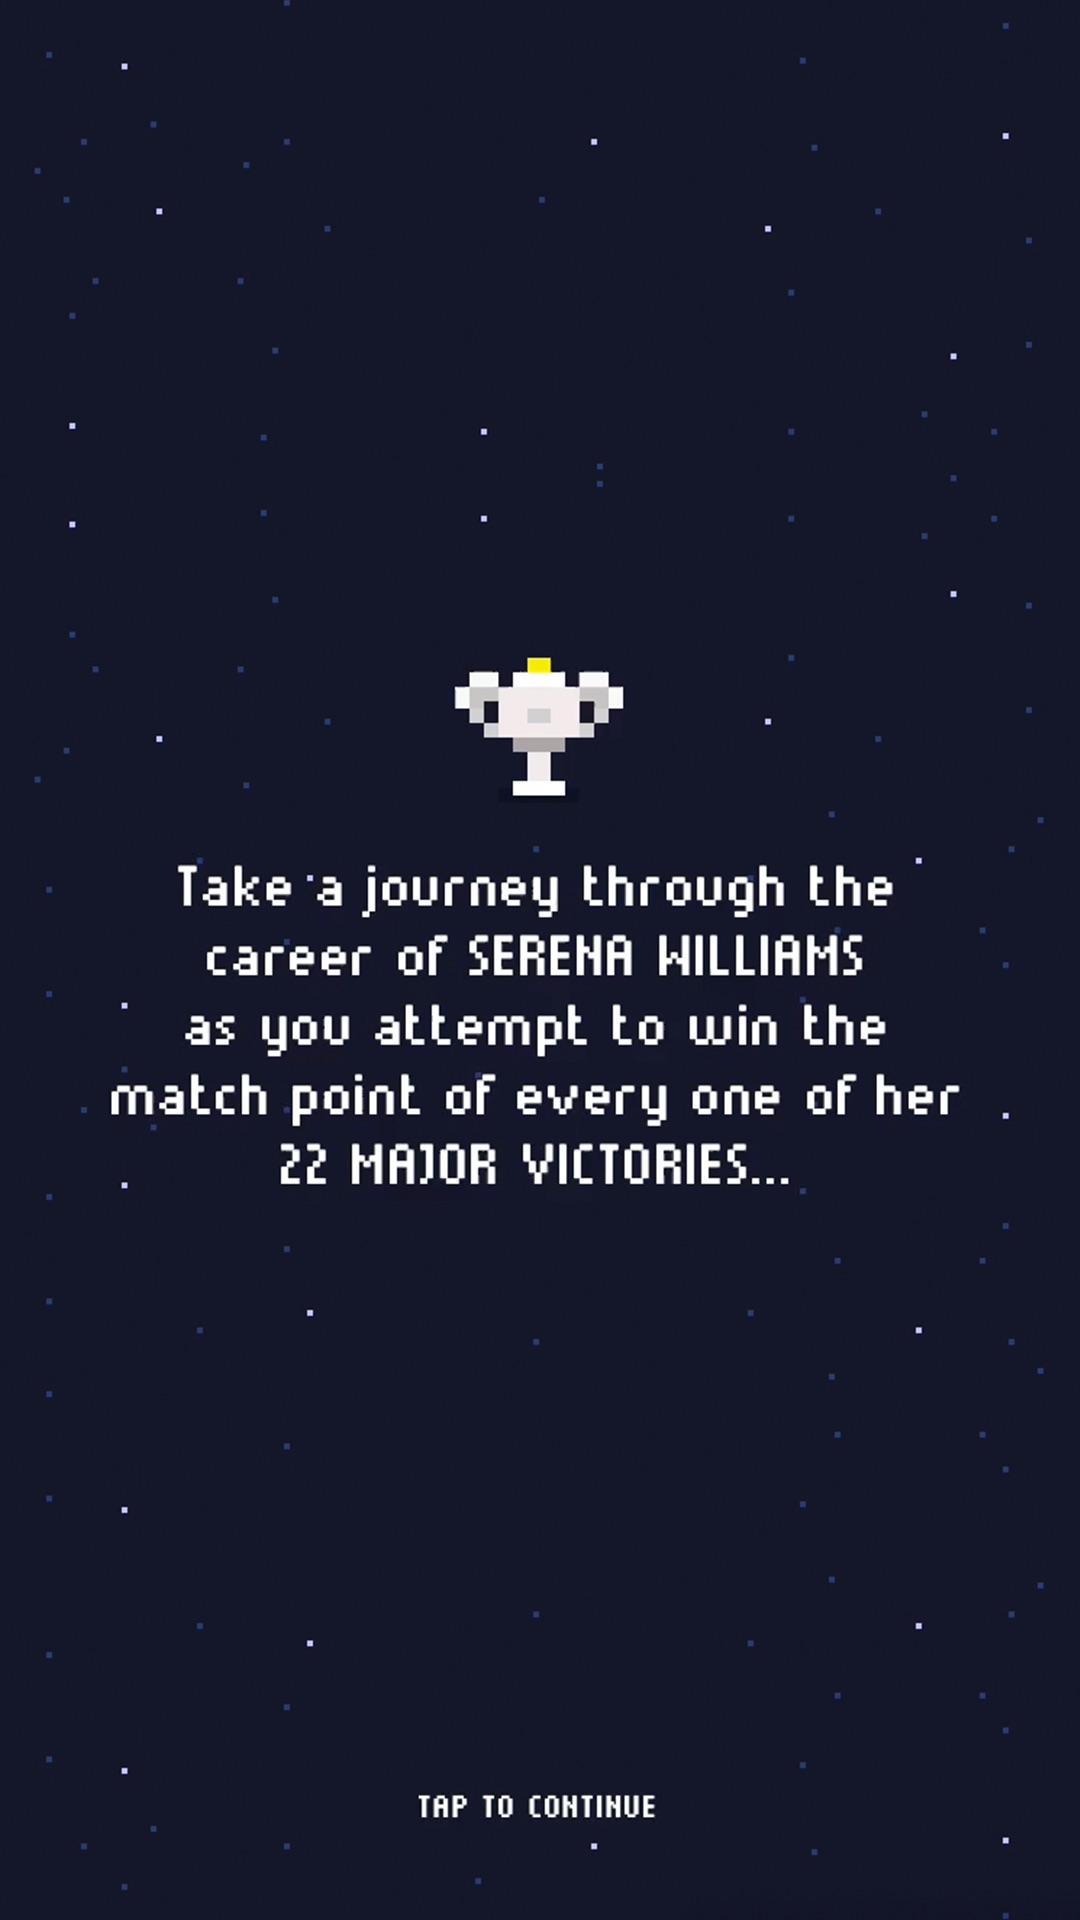 Thumbnail for Serena Williams' Match Point | Gatorade